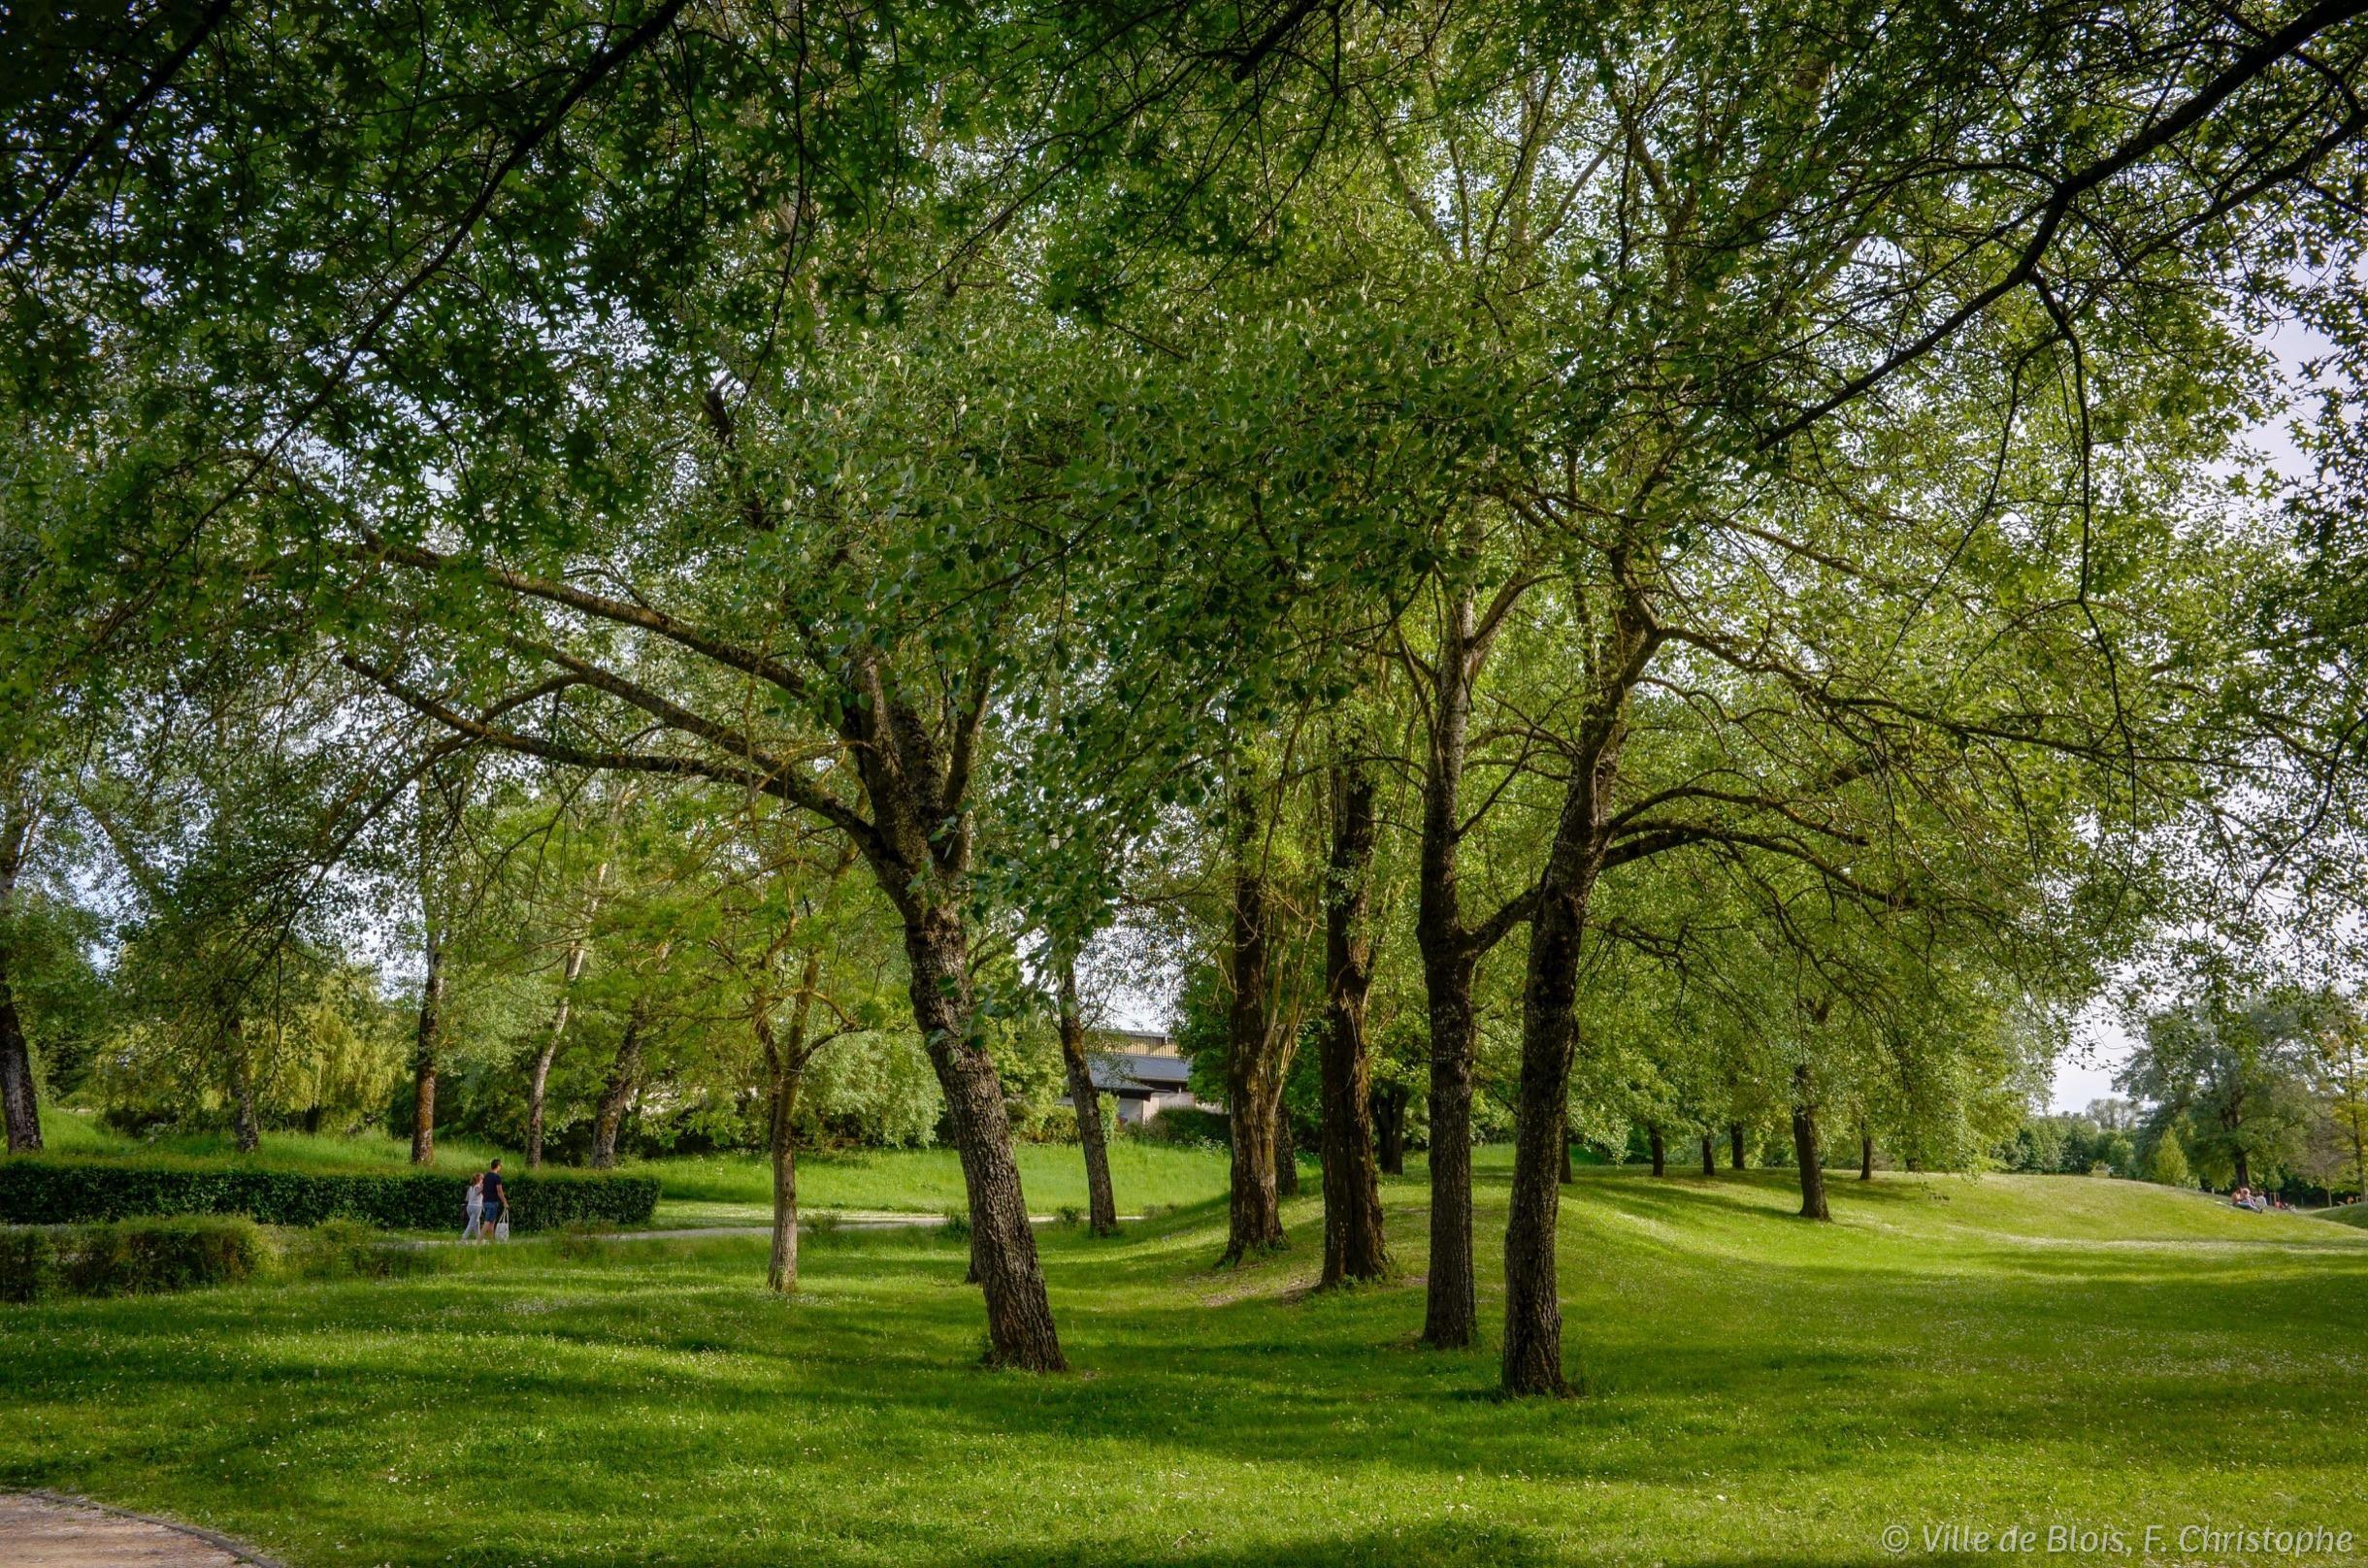 Parc des Mées : de grands arbres font de l'ombre sur l'herbe.